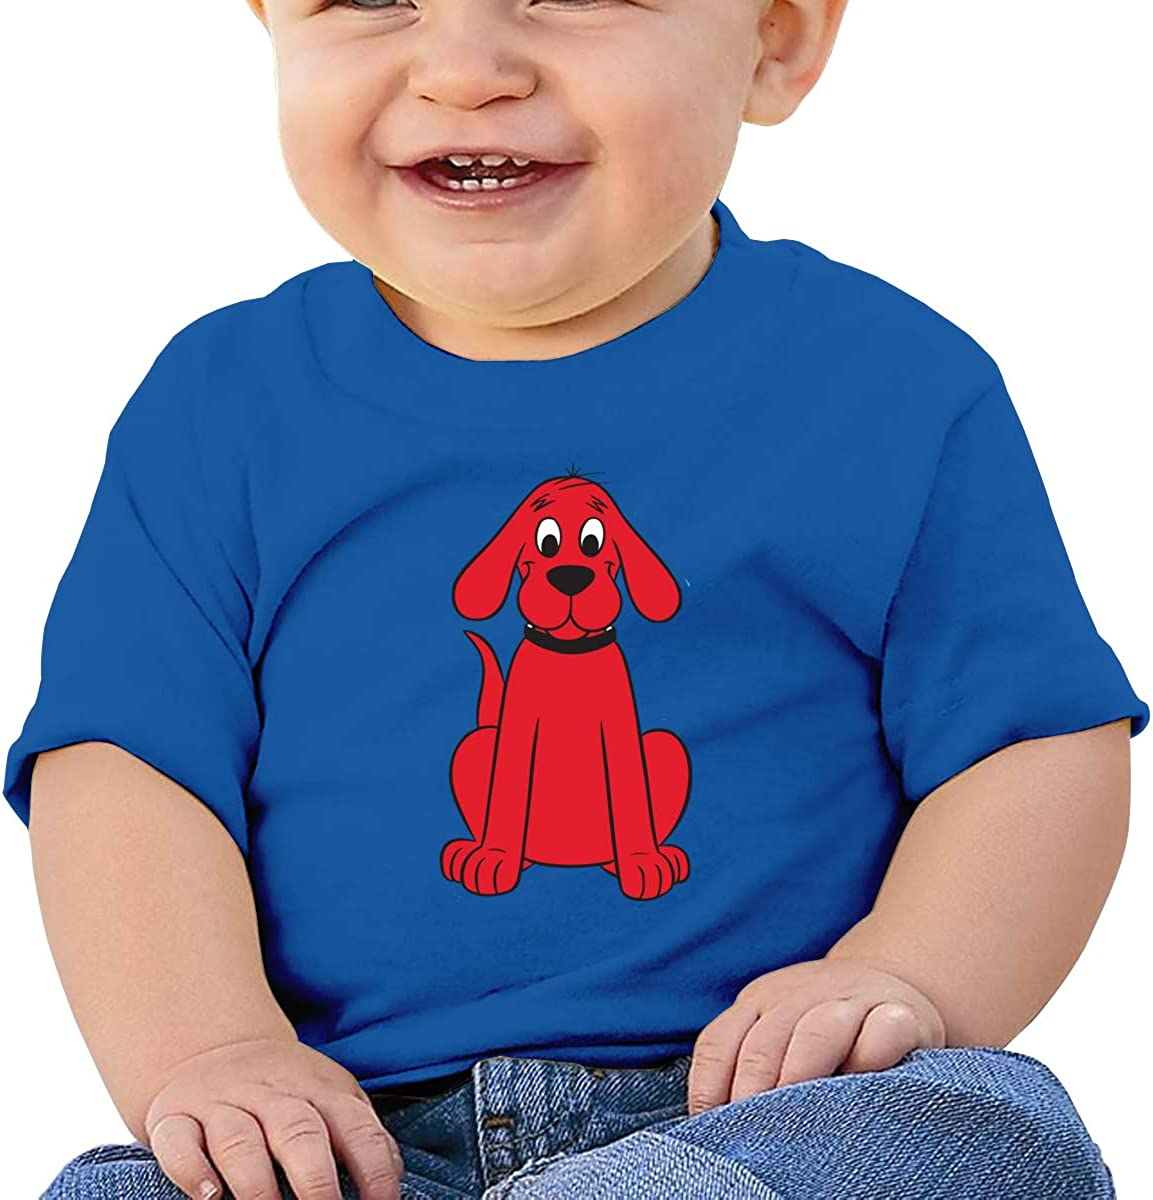 Clifford The Big Red Dog Shirt Baby Boy Girls Cartoon T Shirts Basic Shirt